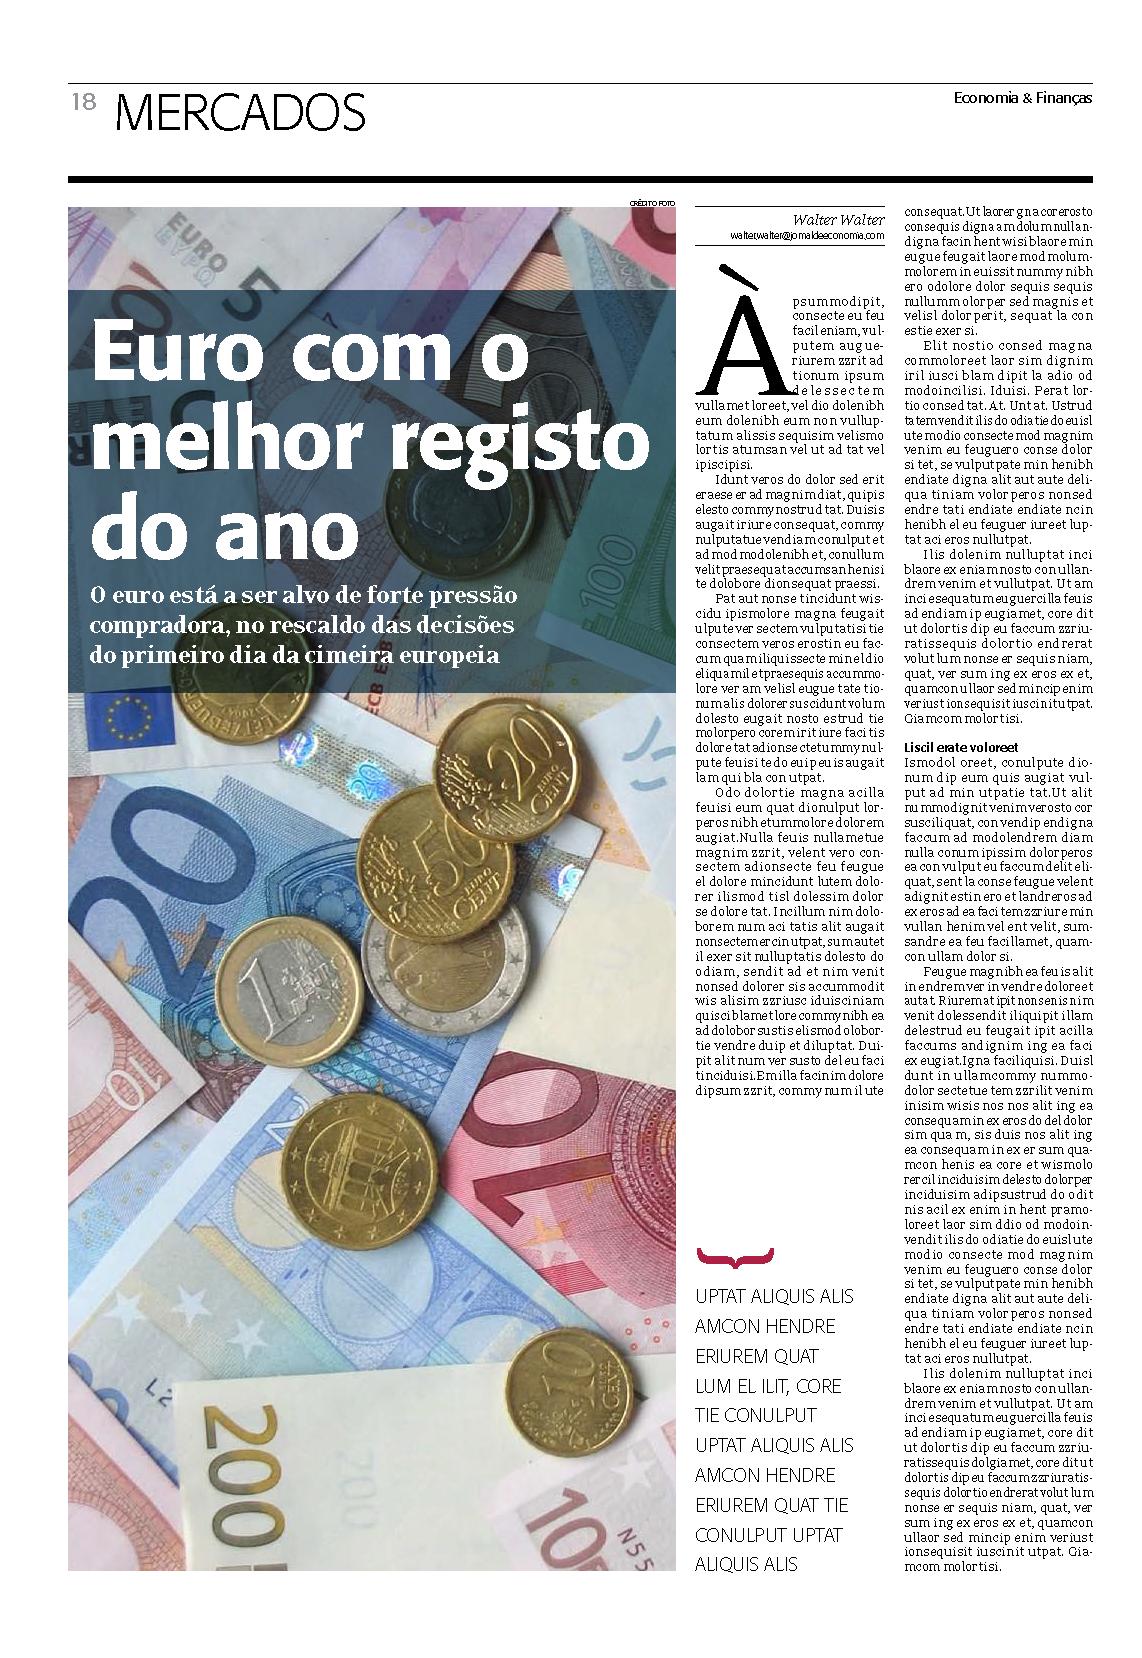 Projecto Economia e Finanças